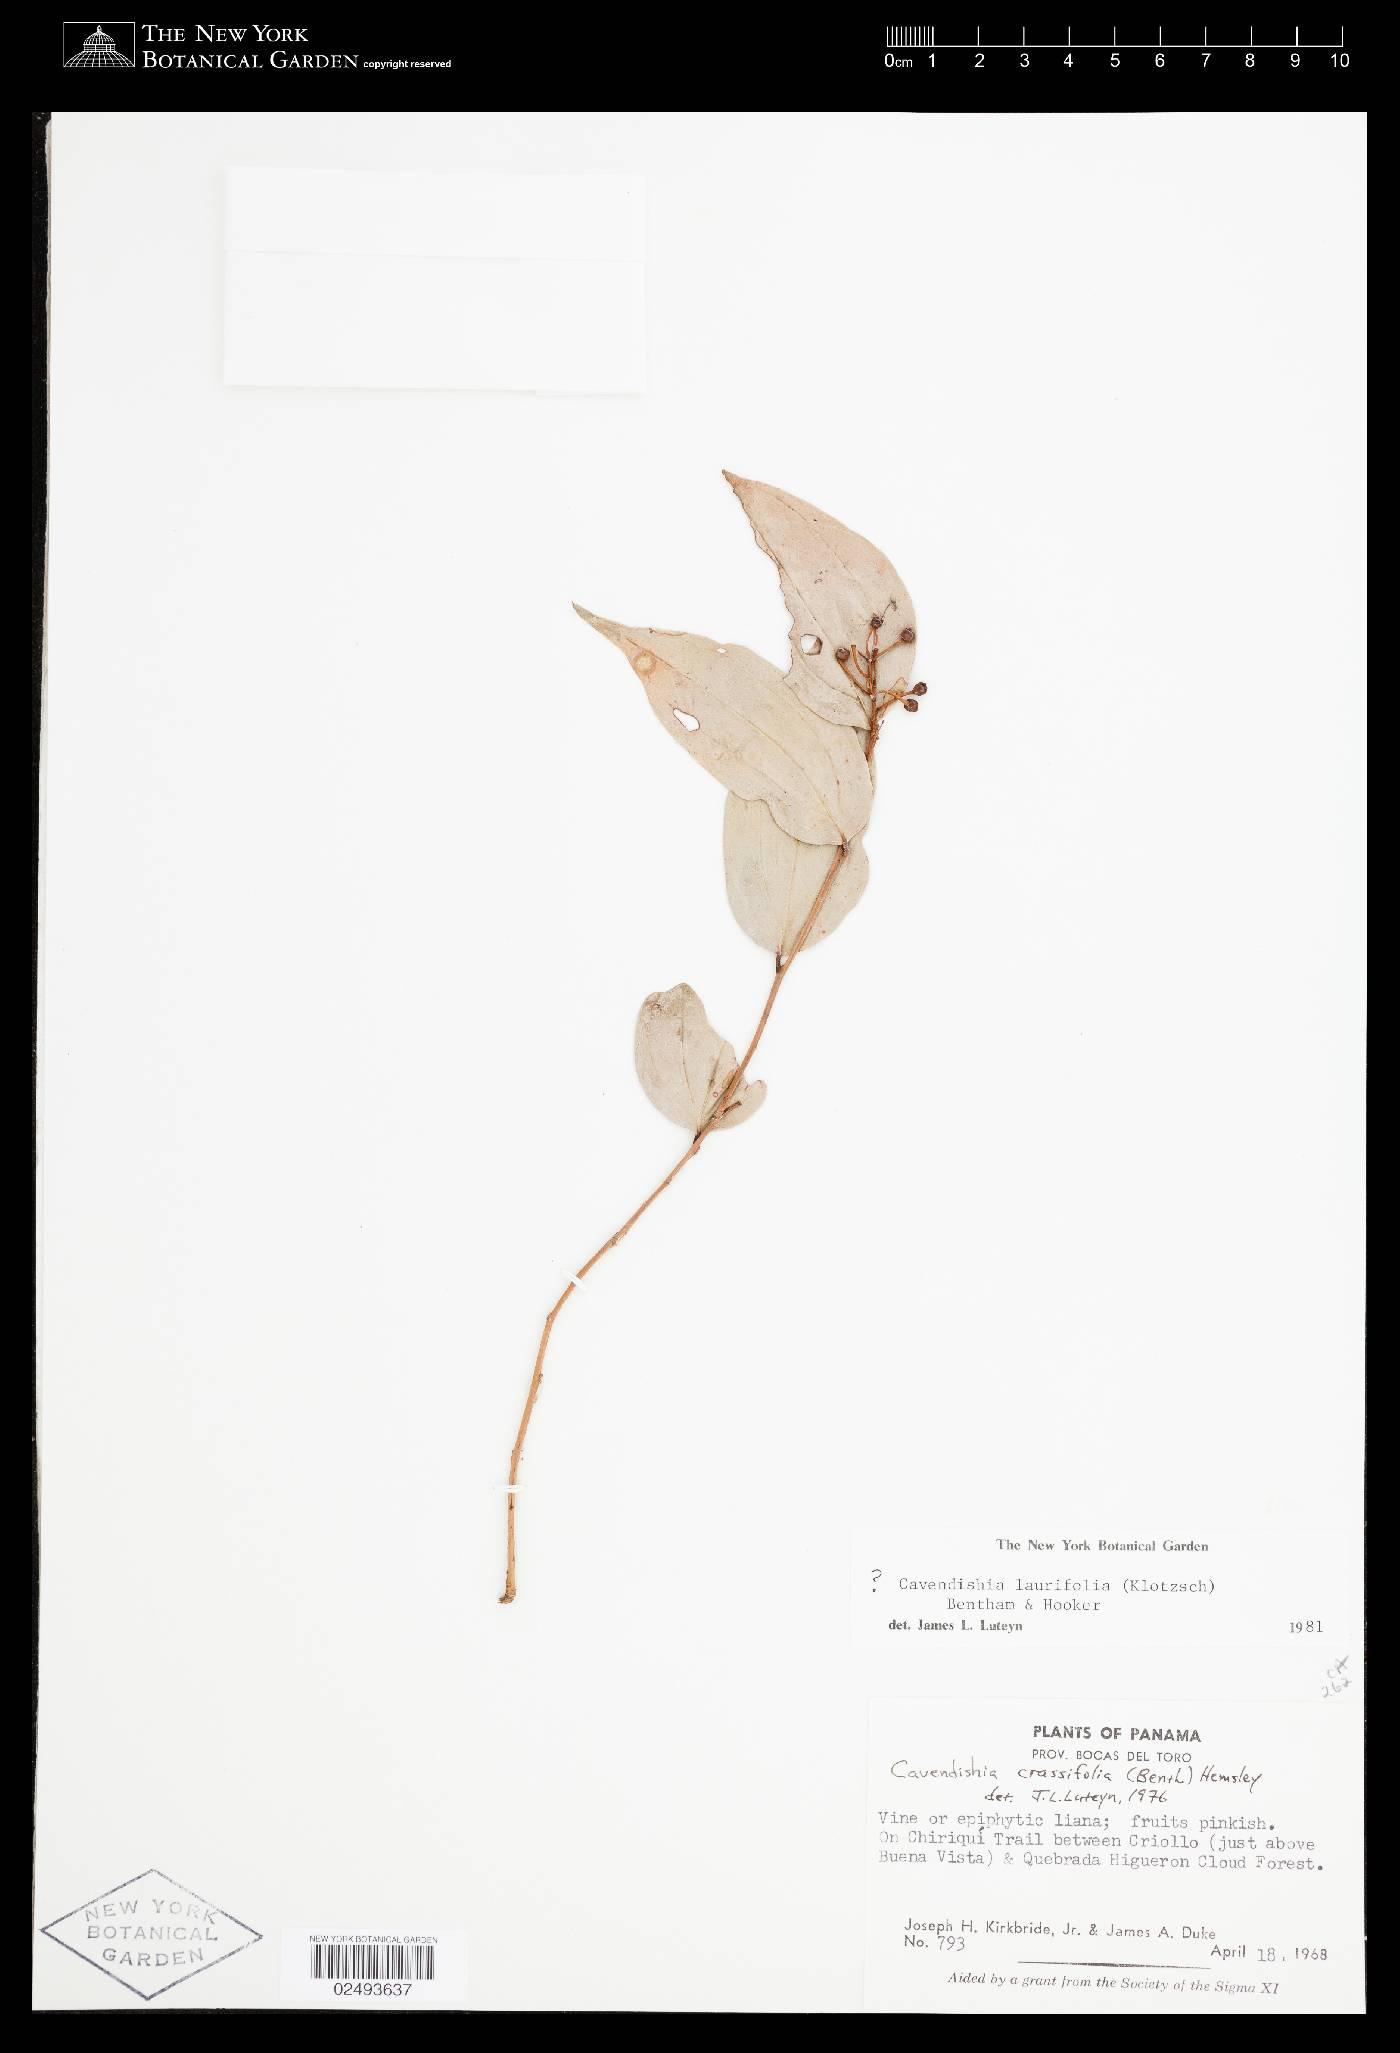 Cavendishia laurifolia image